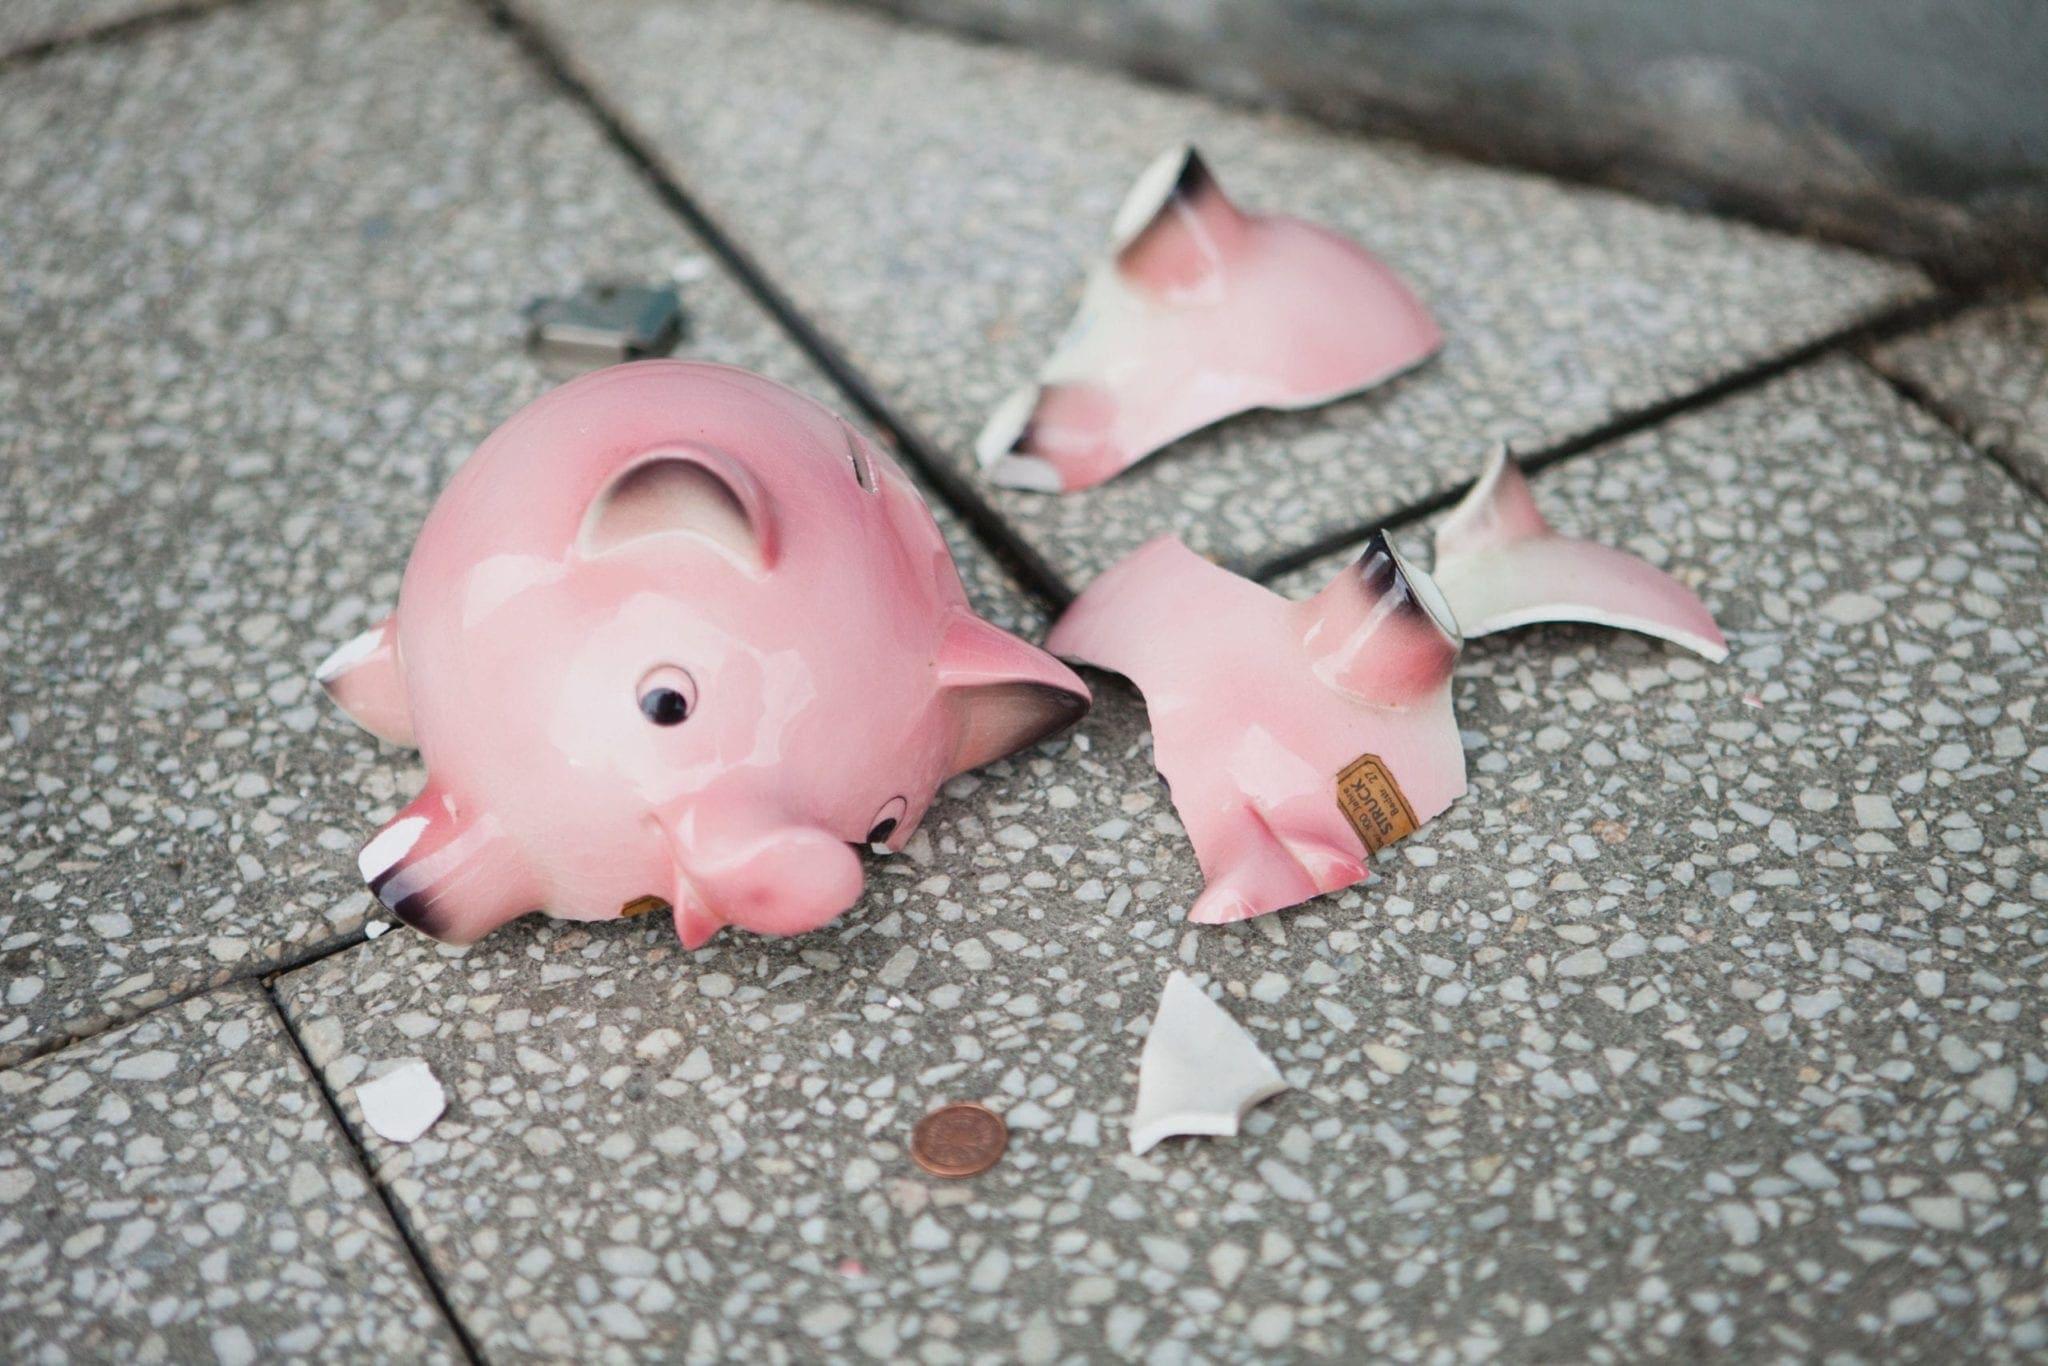 State Ed admits $12 million funding error